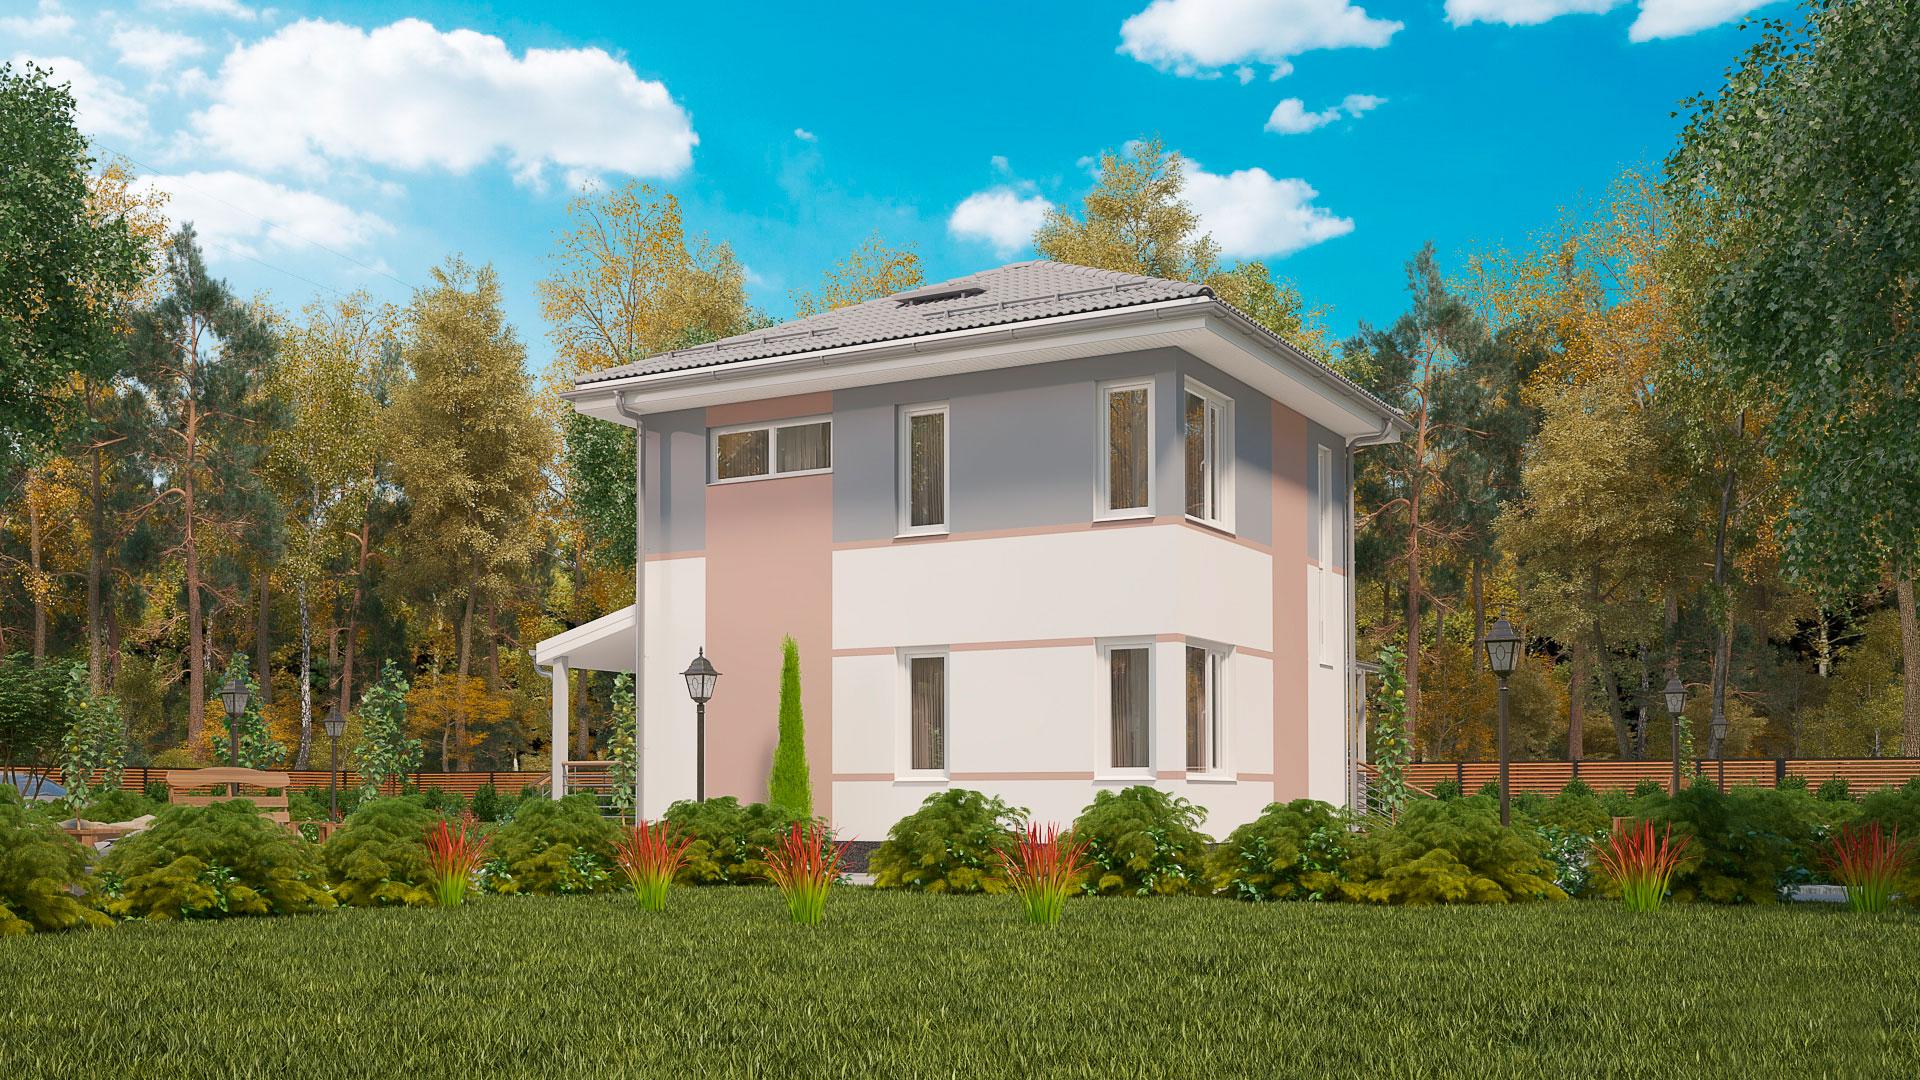 Боковой фасад двухэтажного дома БЭНПАН, проект МС-176/3.